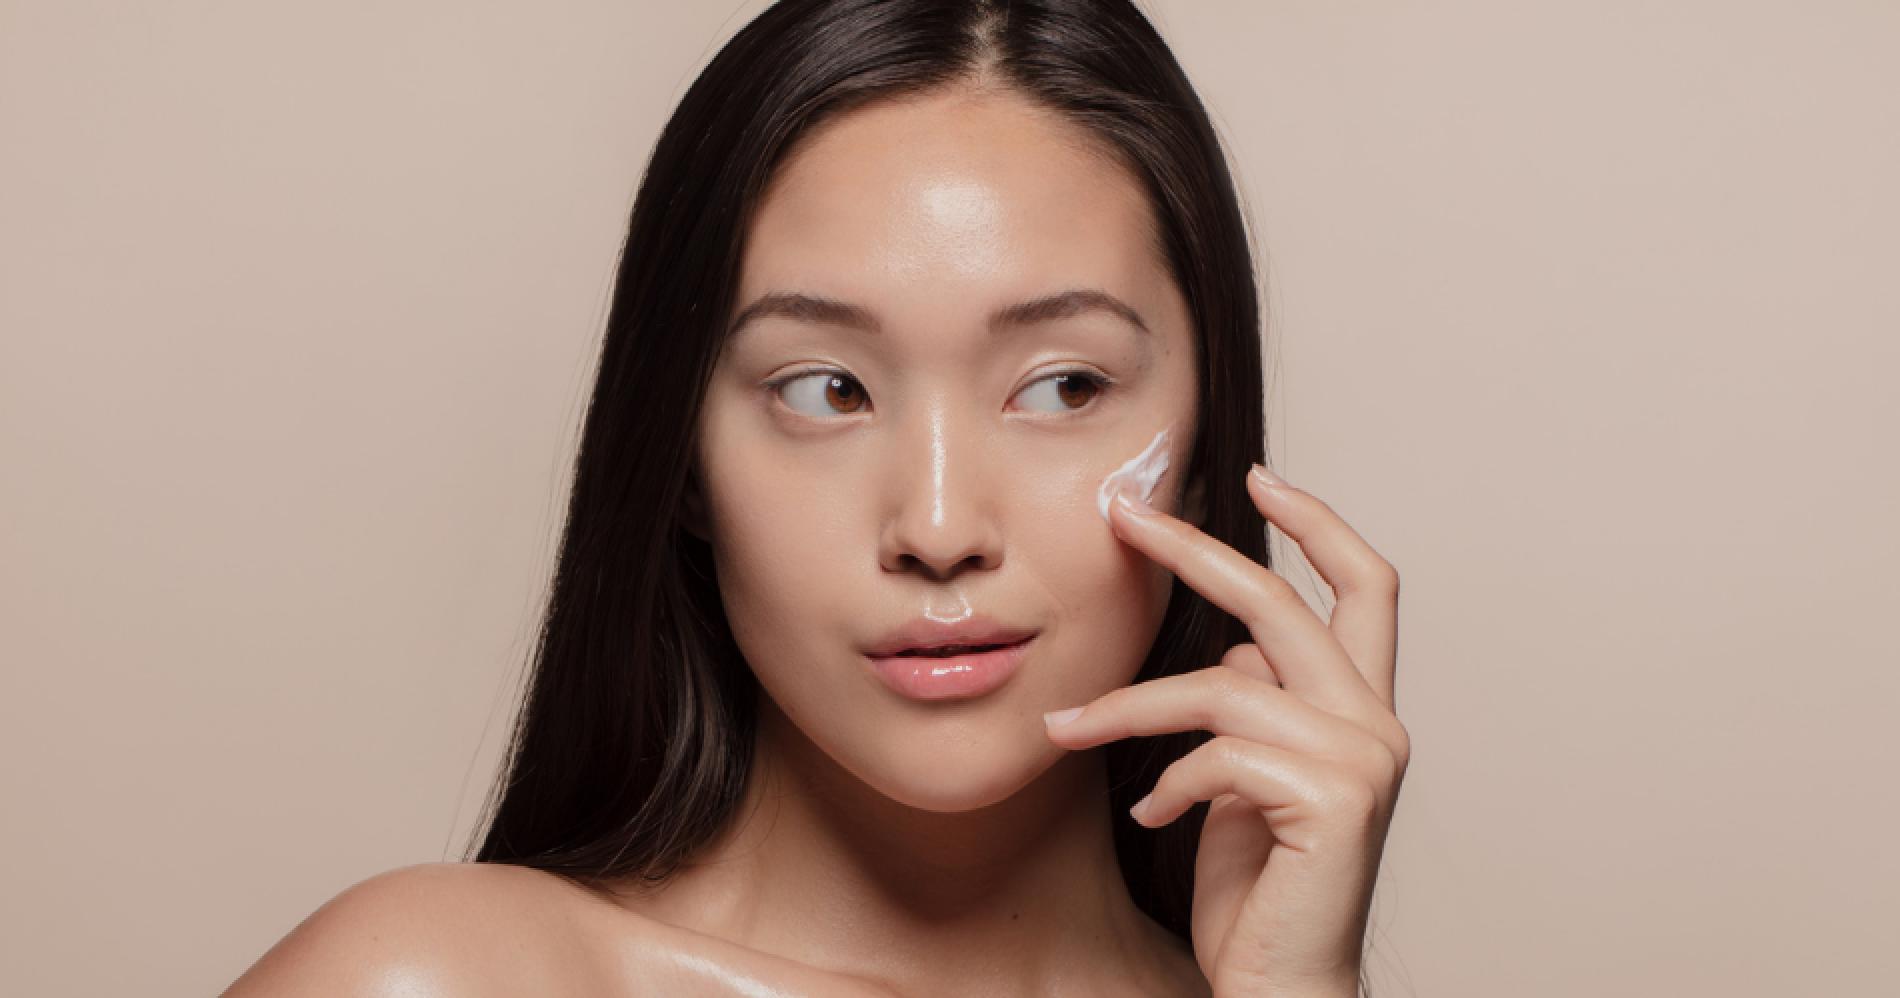 Beauty Illustration Web Bisnis Muda - Canva